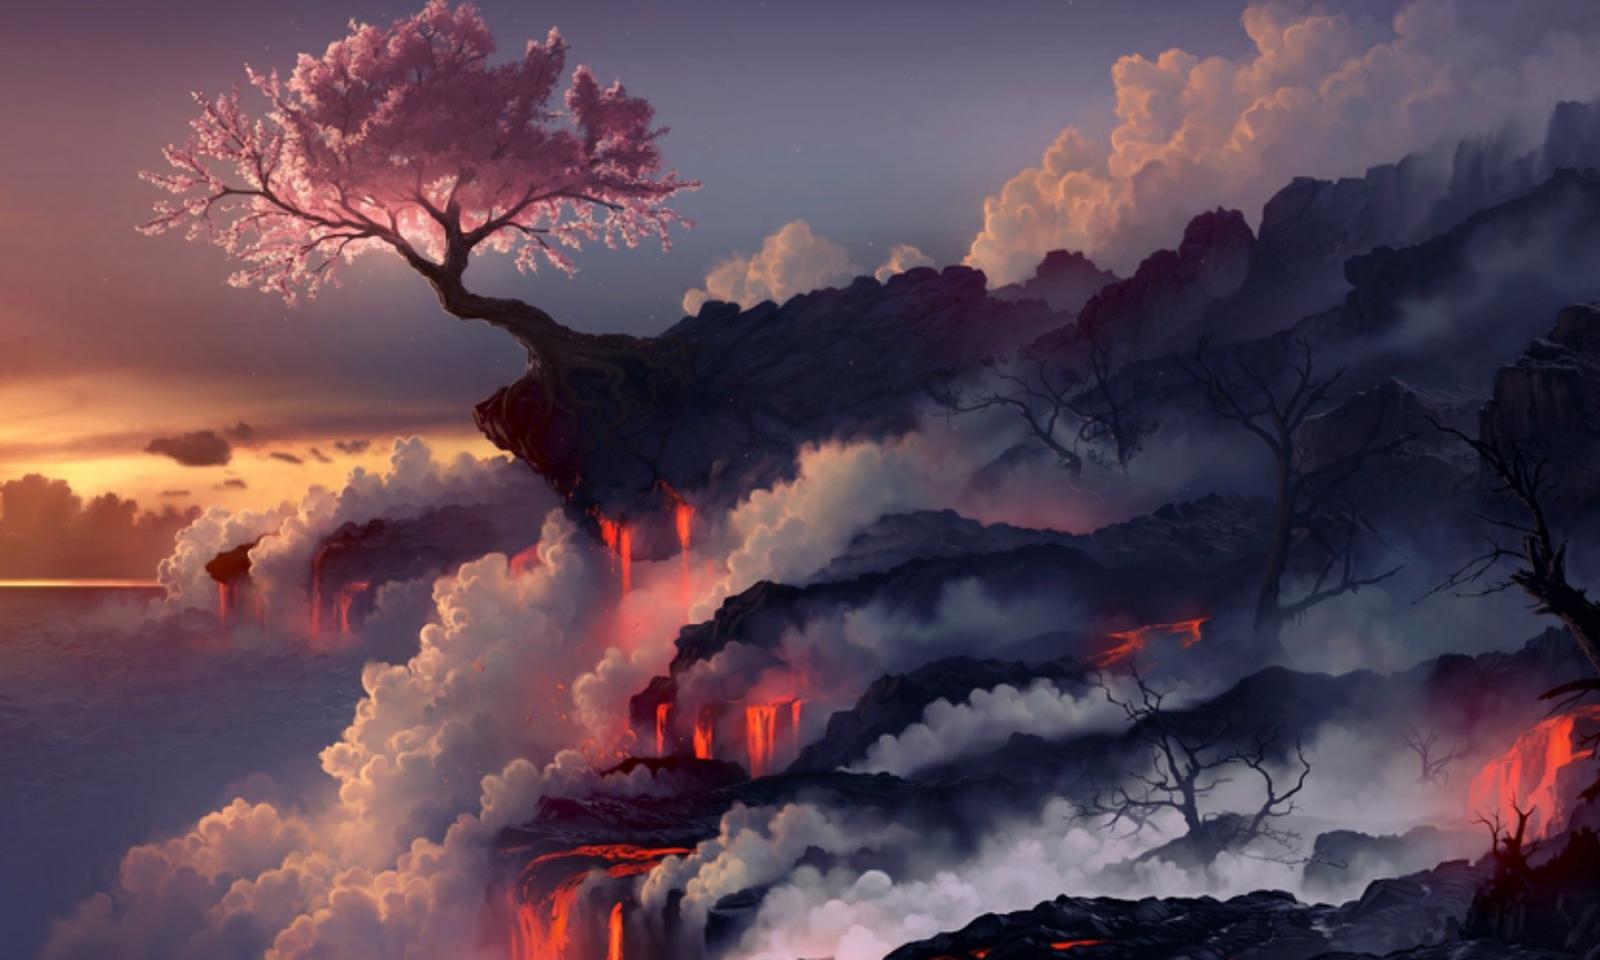 Weird Wallpaper Center: Volcano Wallpaper | Explosion ...